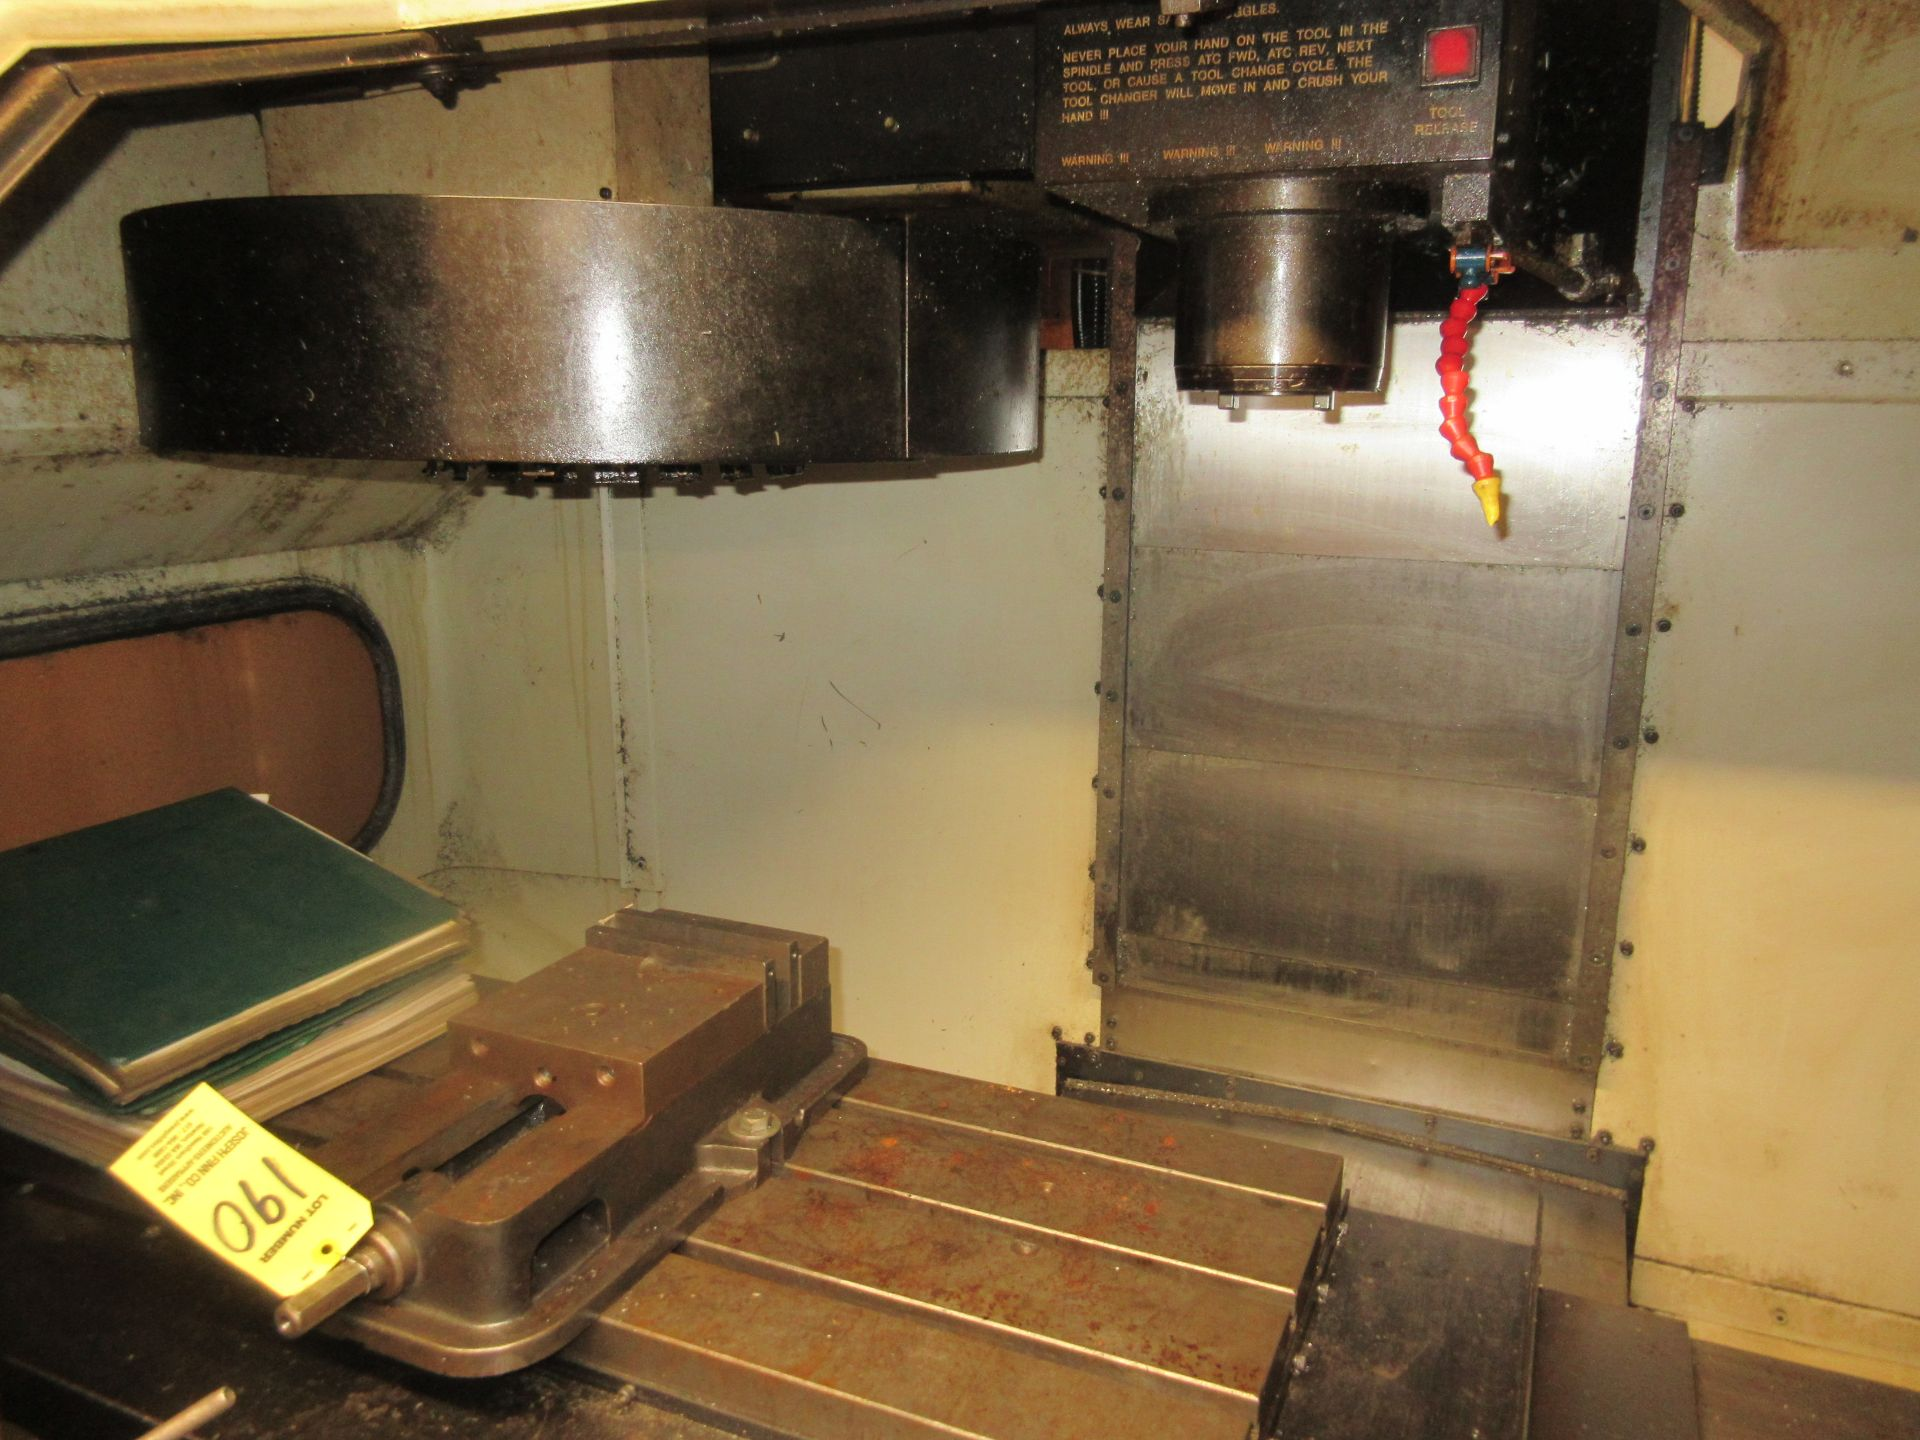 (1) 1993 Haas VF-2 CNC Vertical Milling Machine S/N 2309 - Image 3 of 7